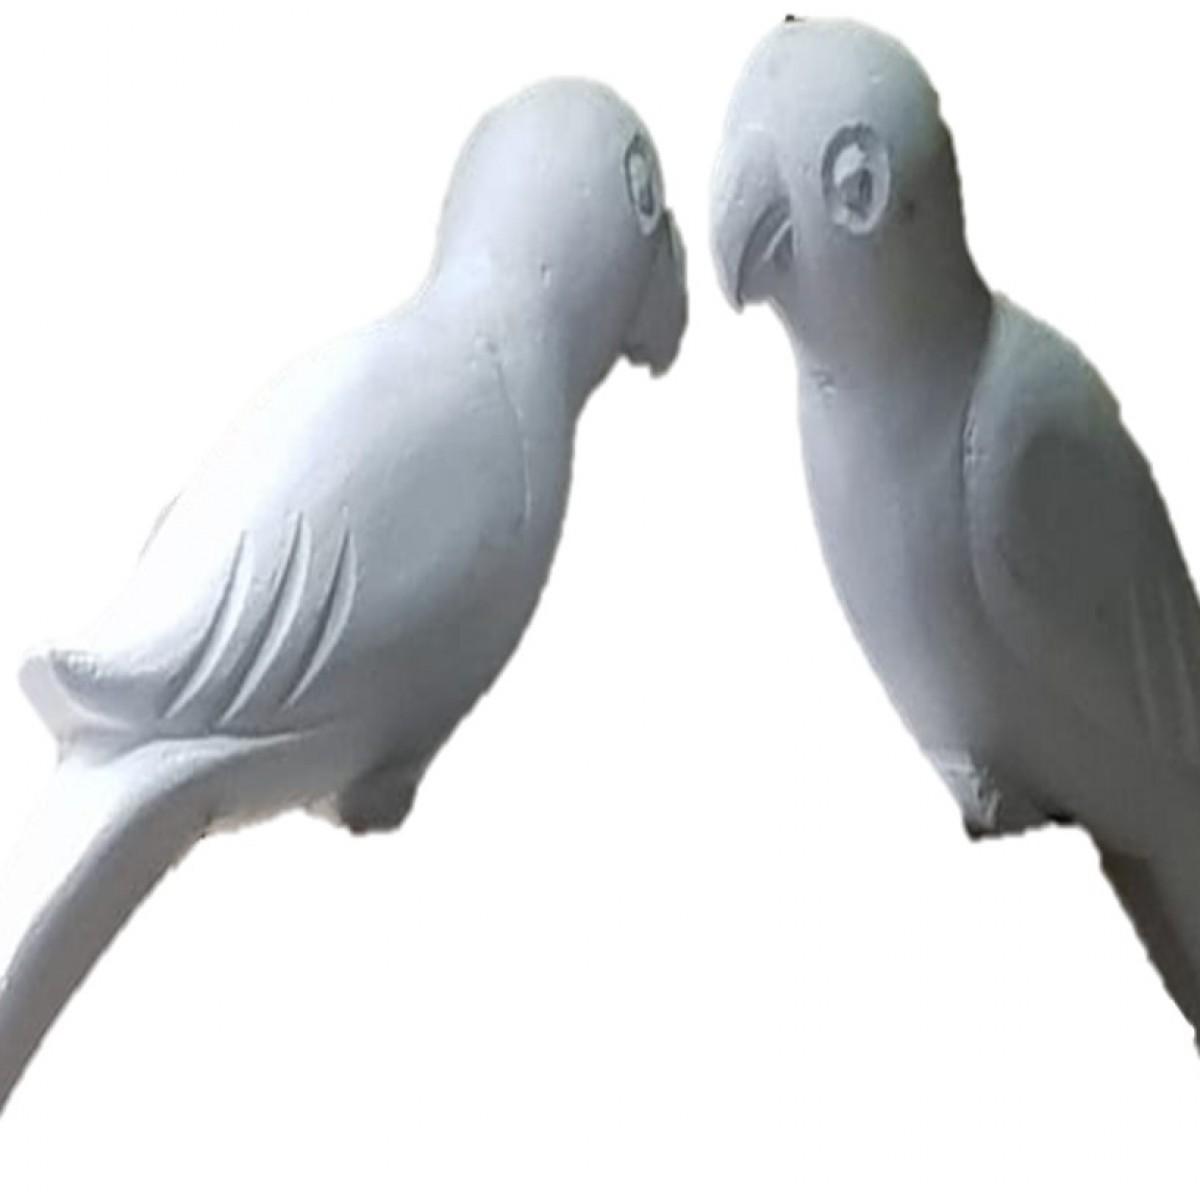 Styrofoam Parrot 3x3ft - 1  No